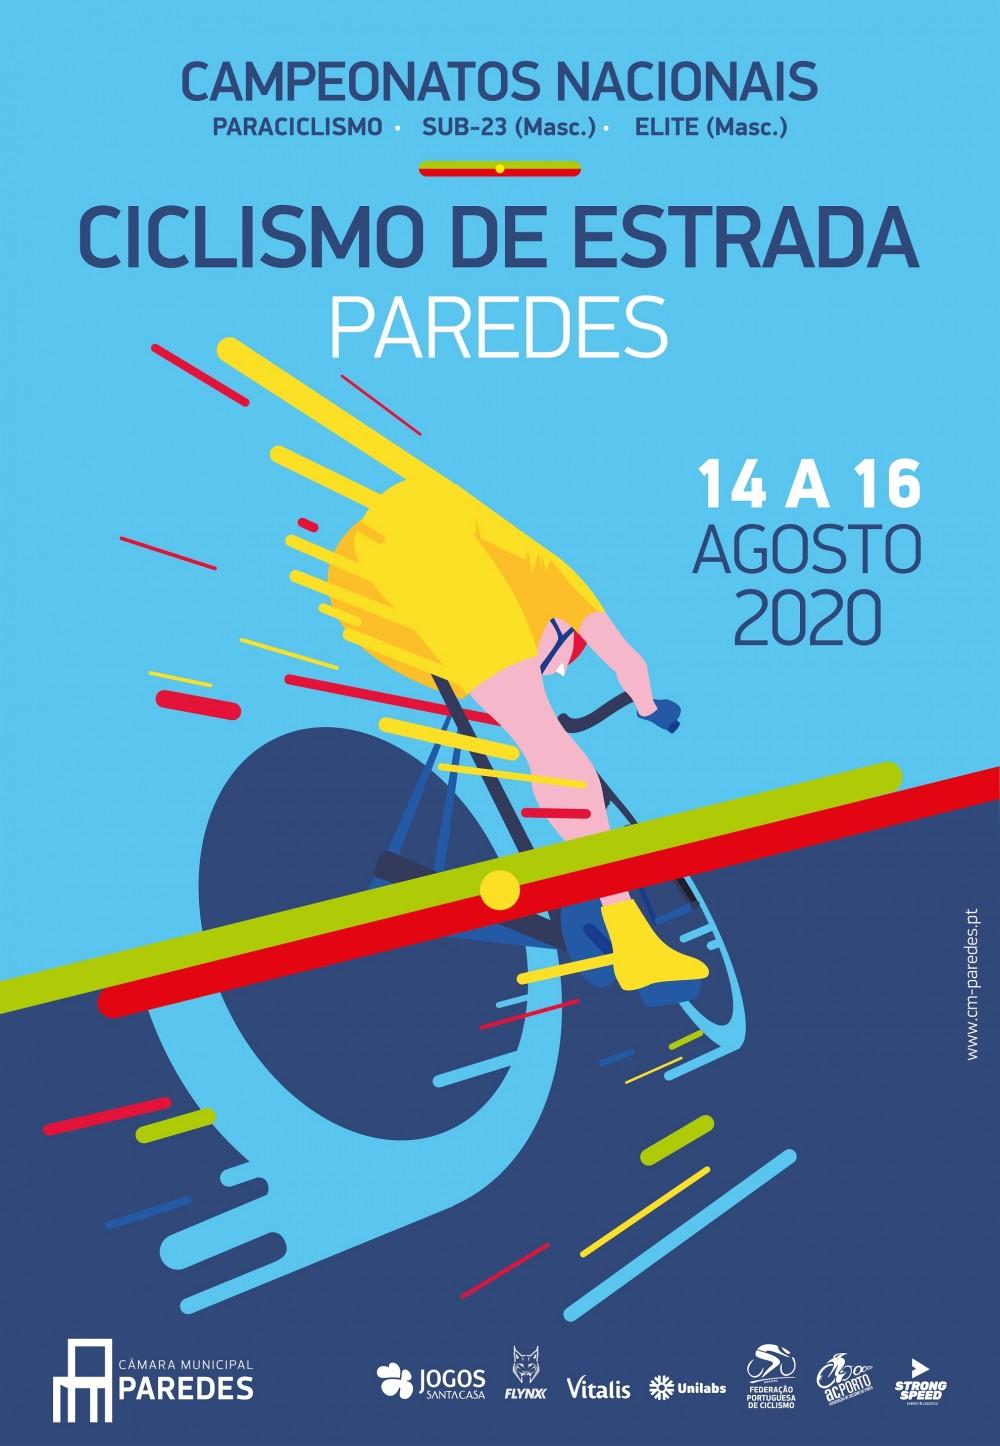 Campeonato Nacional Estrada - Sub23 Masc. / Elite Masc.